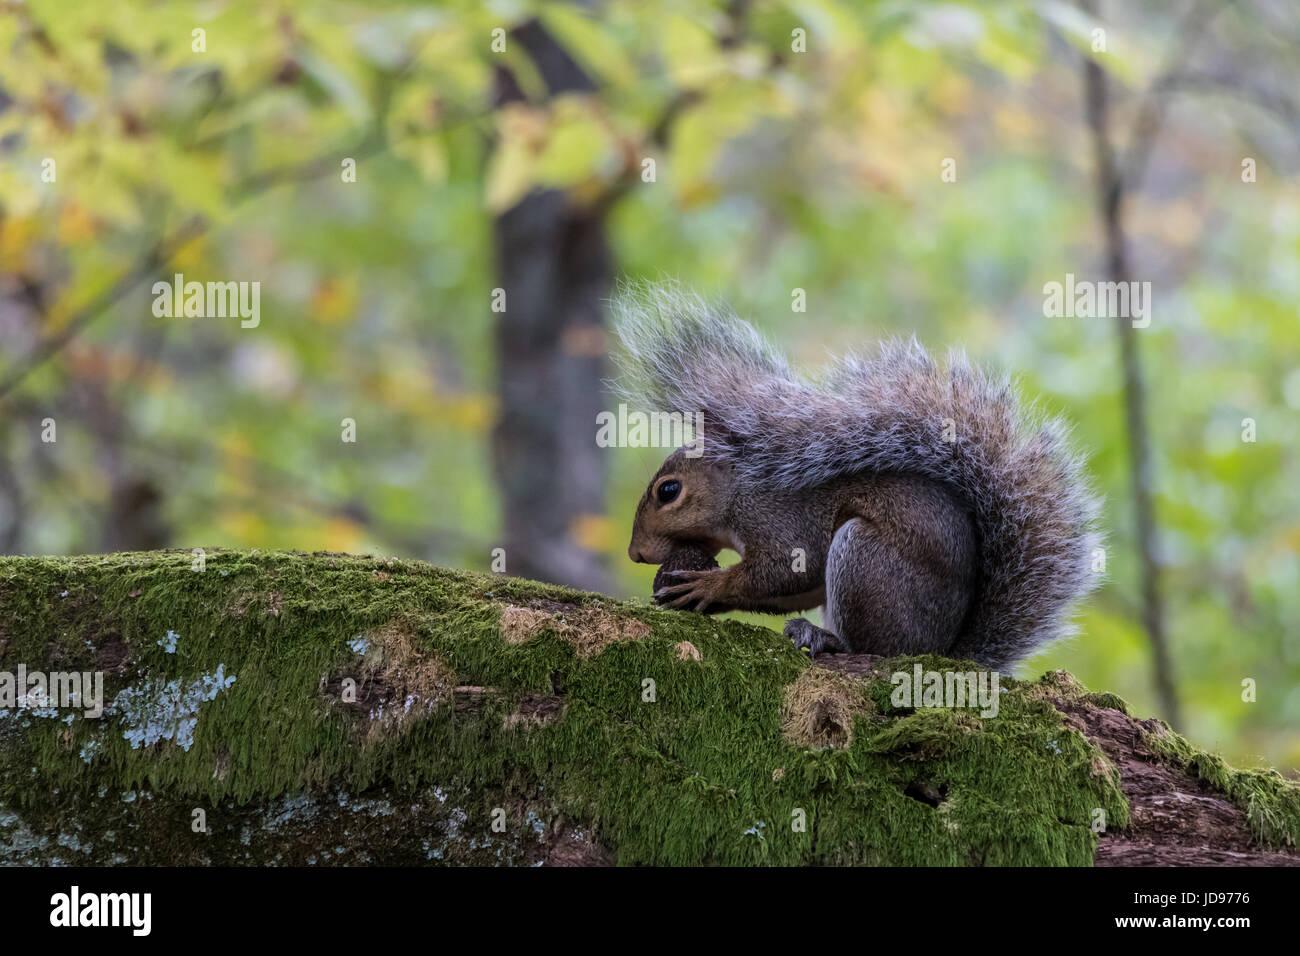 Eastern grey squirrel (Sciurus carolinensis) eating an acorn. - Stock Image